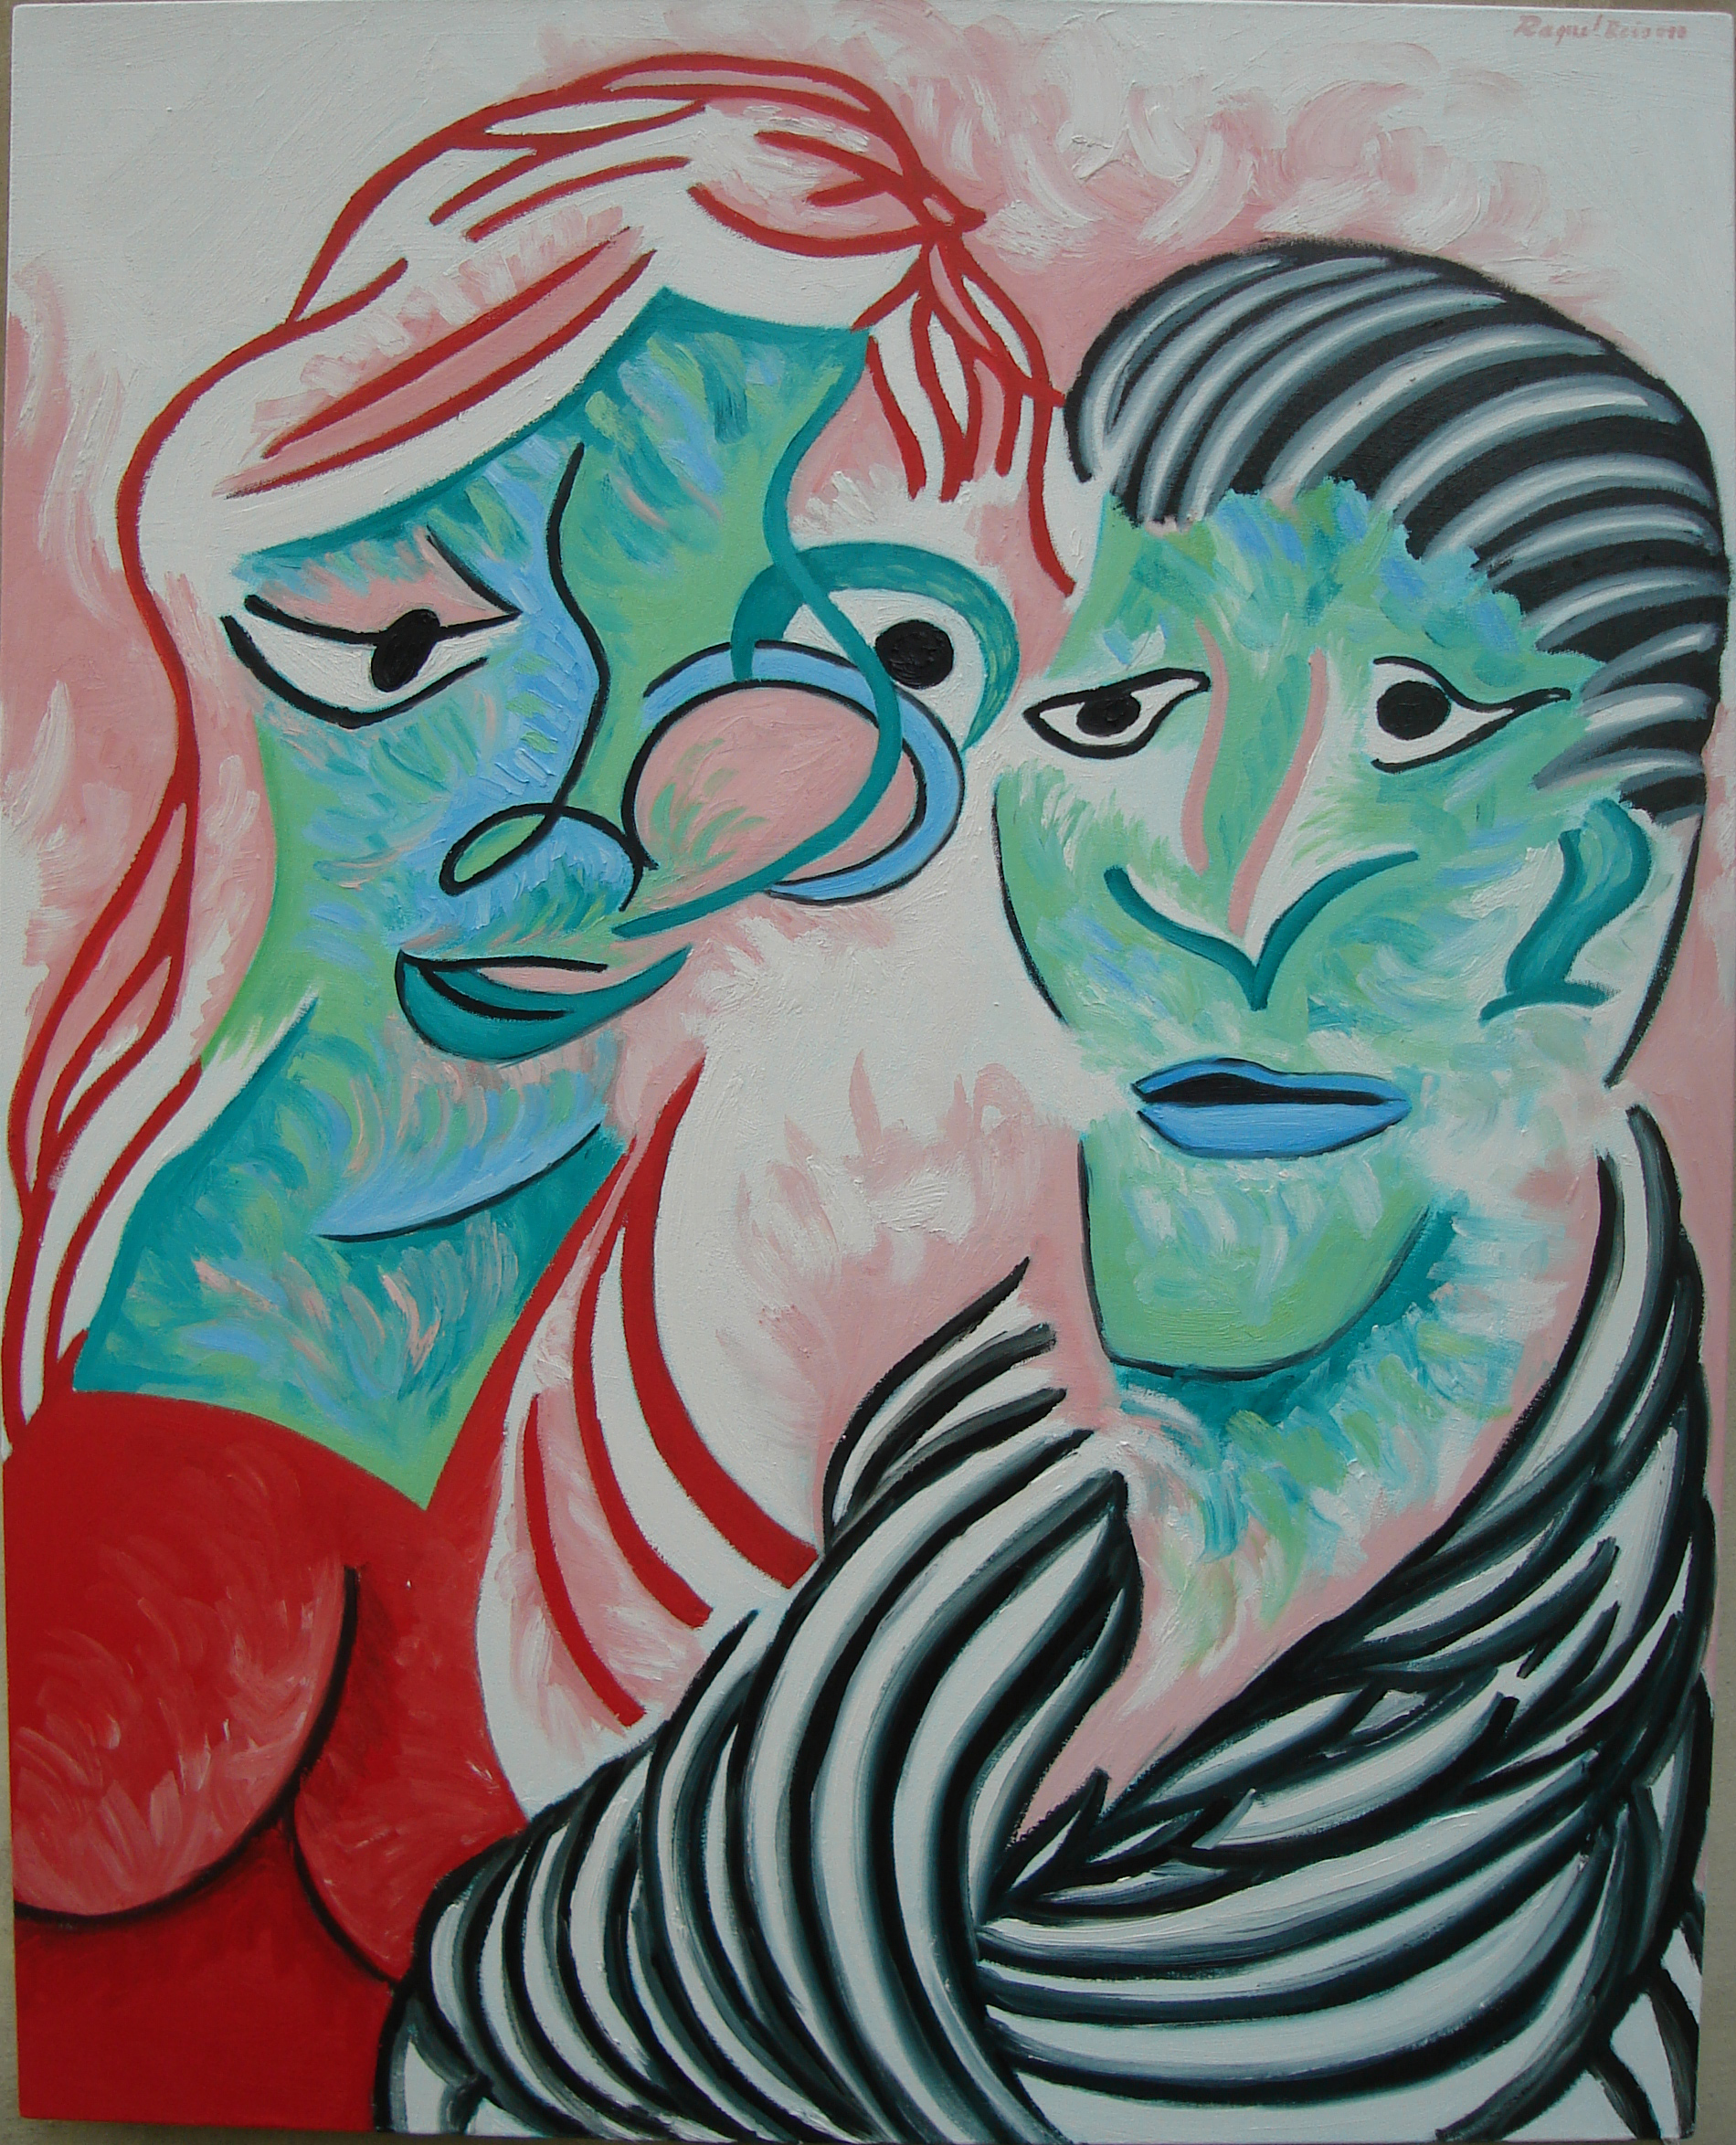 Mulher e homem / Woman and man